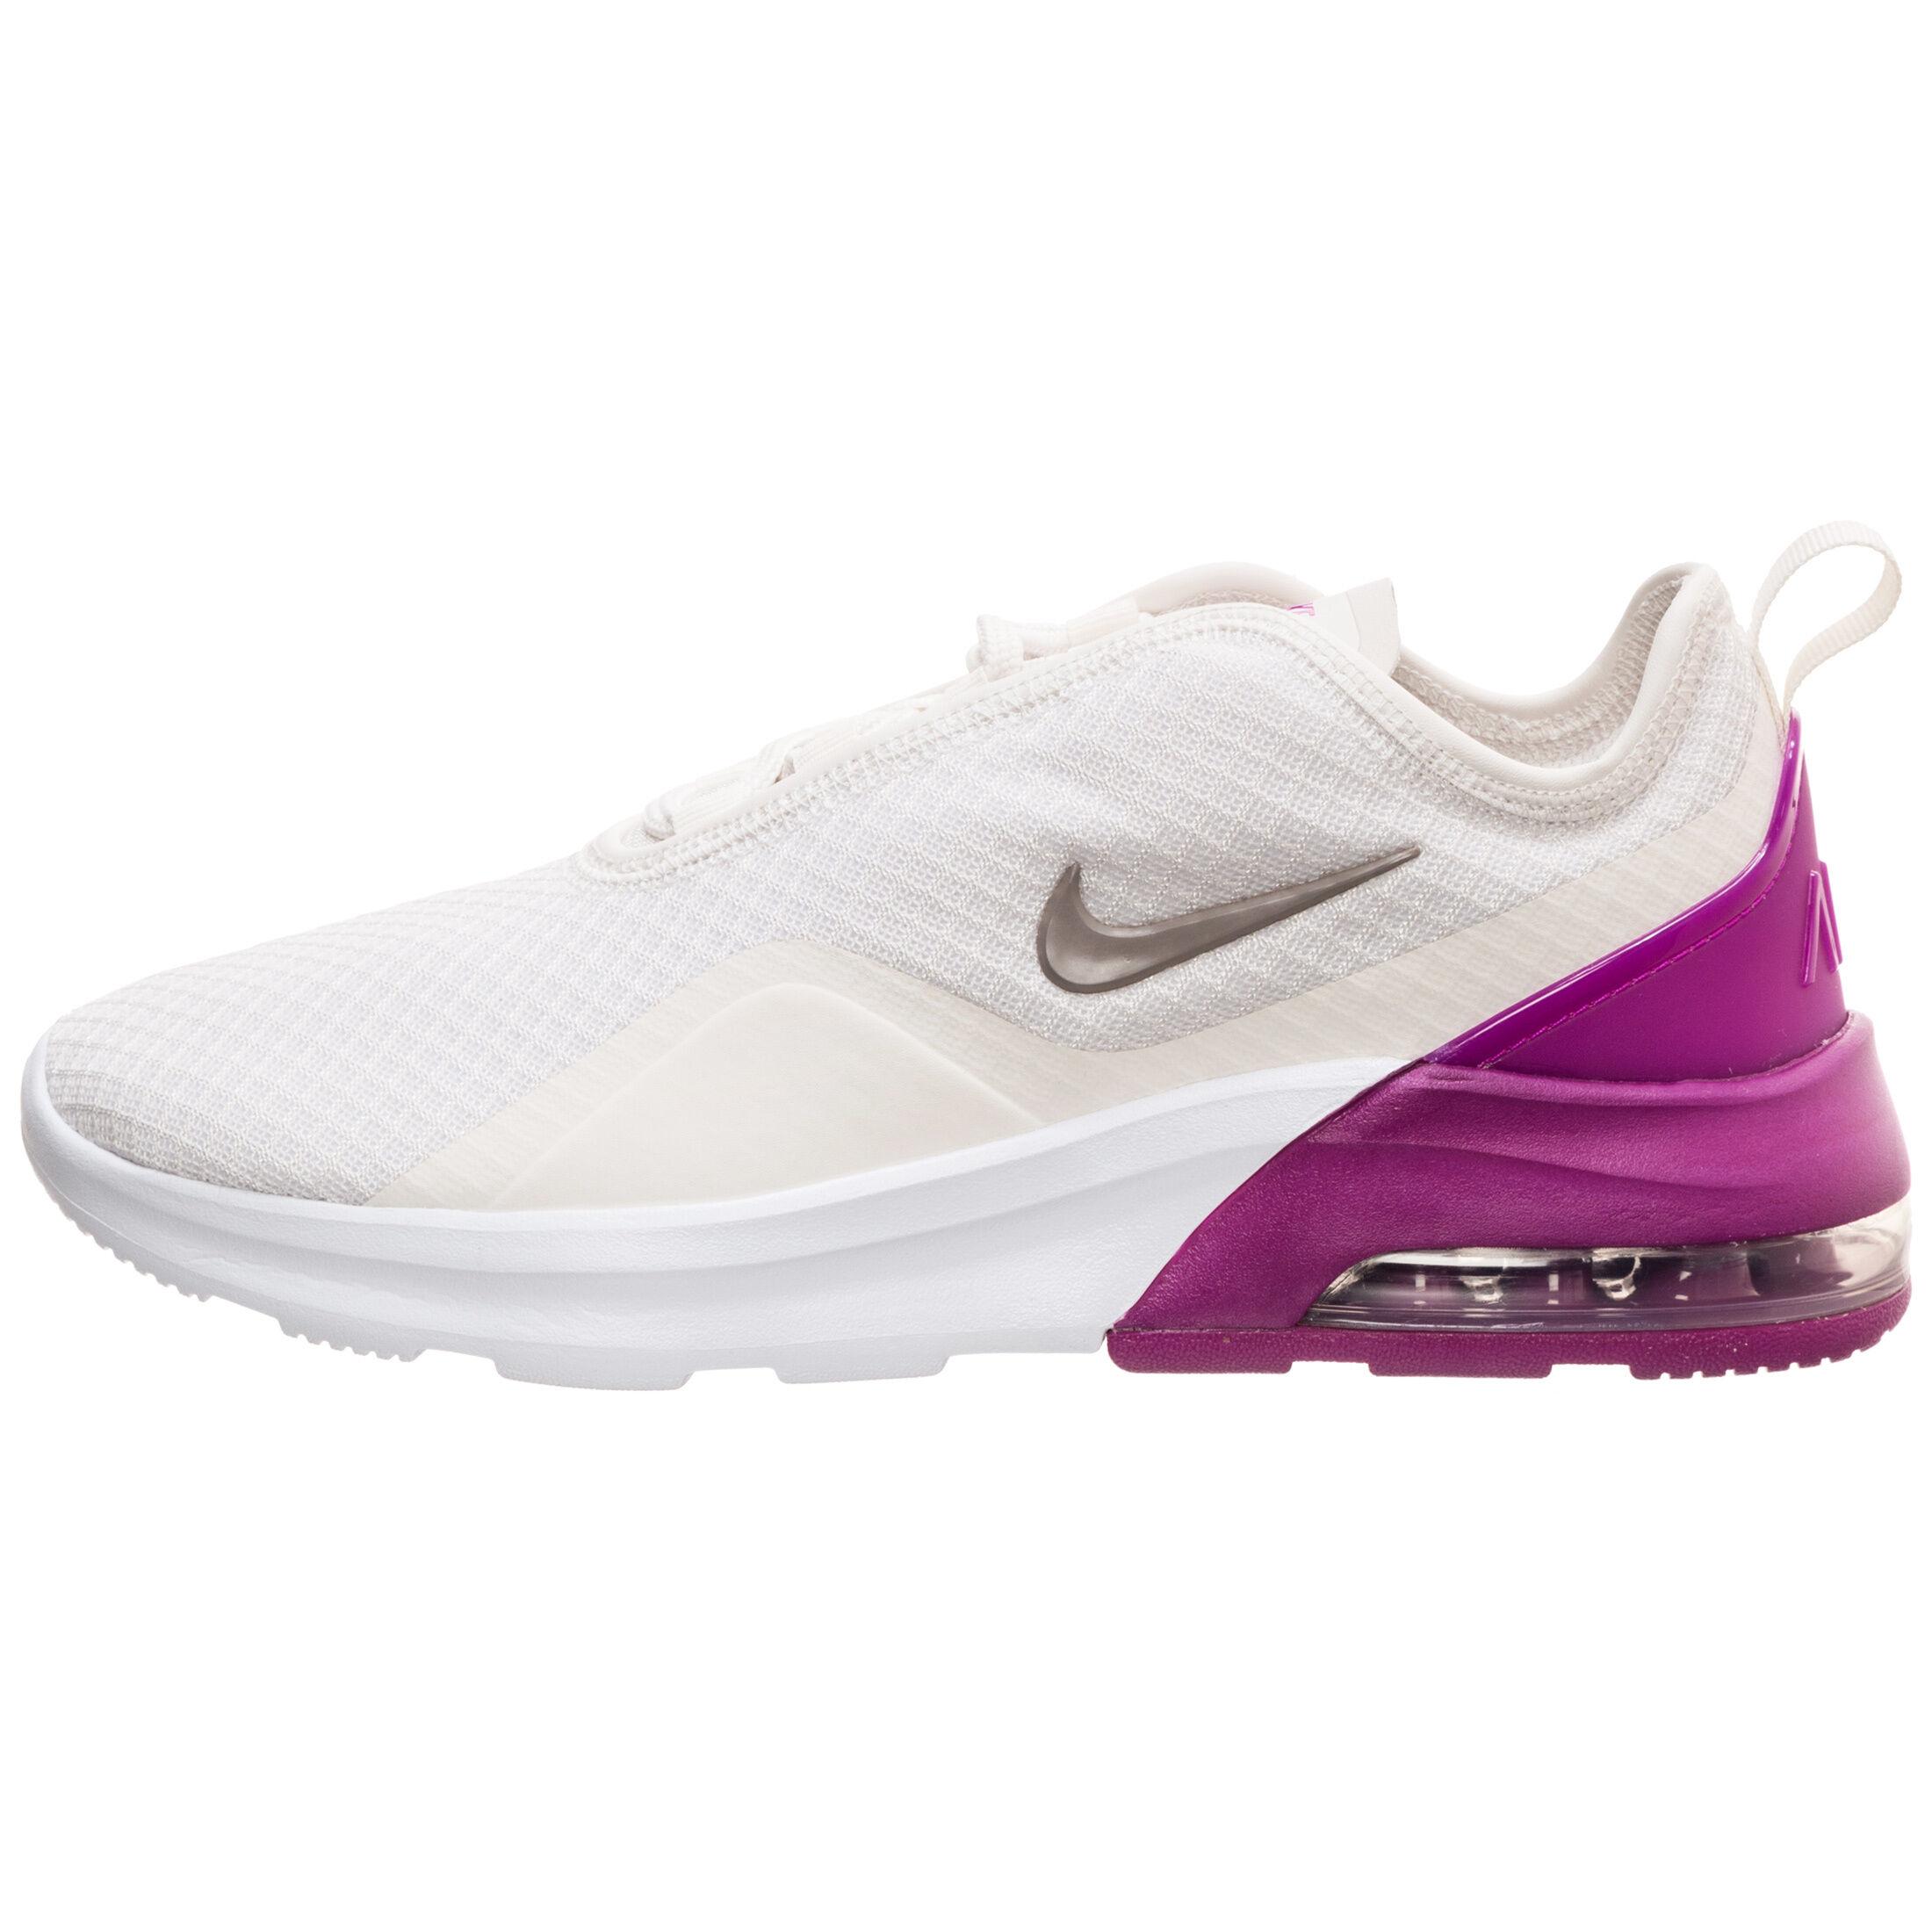 Sportswear Max Sneaker bei Air Motion Damen OUTFITTER Nike 2 bvf67gYy